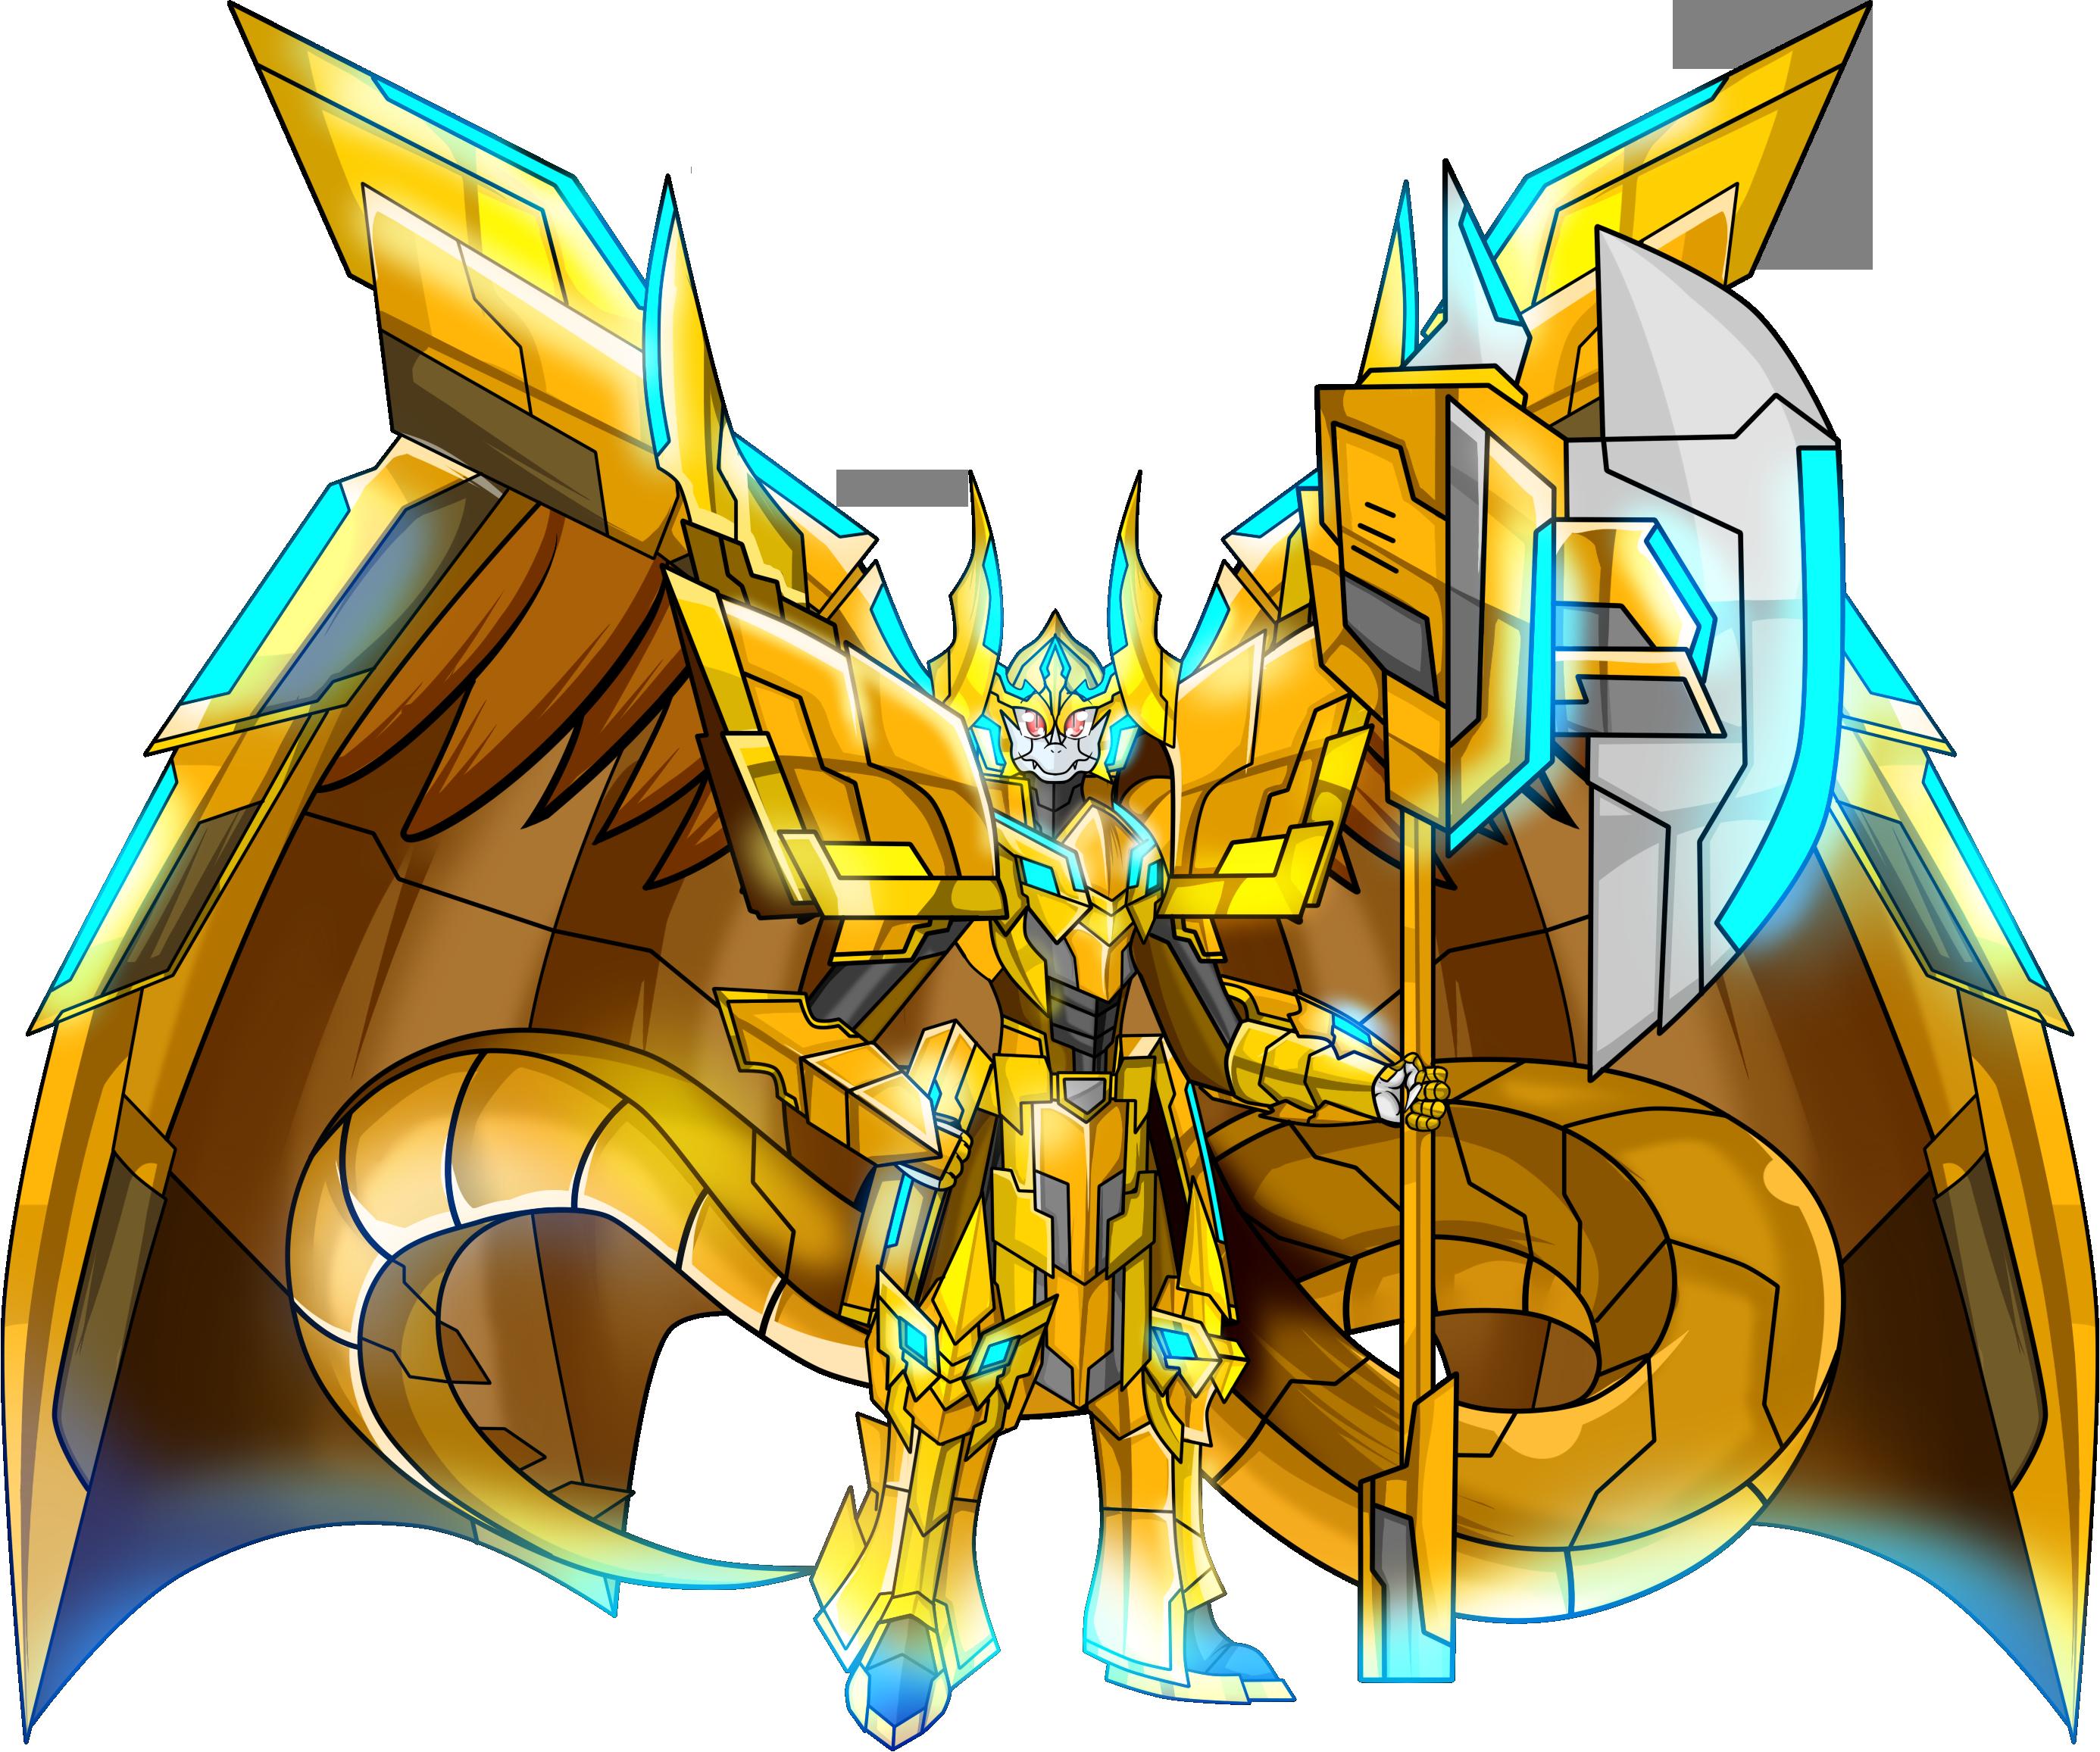 digimon by dragonnova52 on deviantart